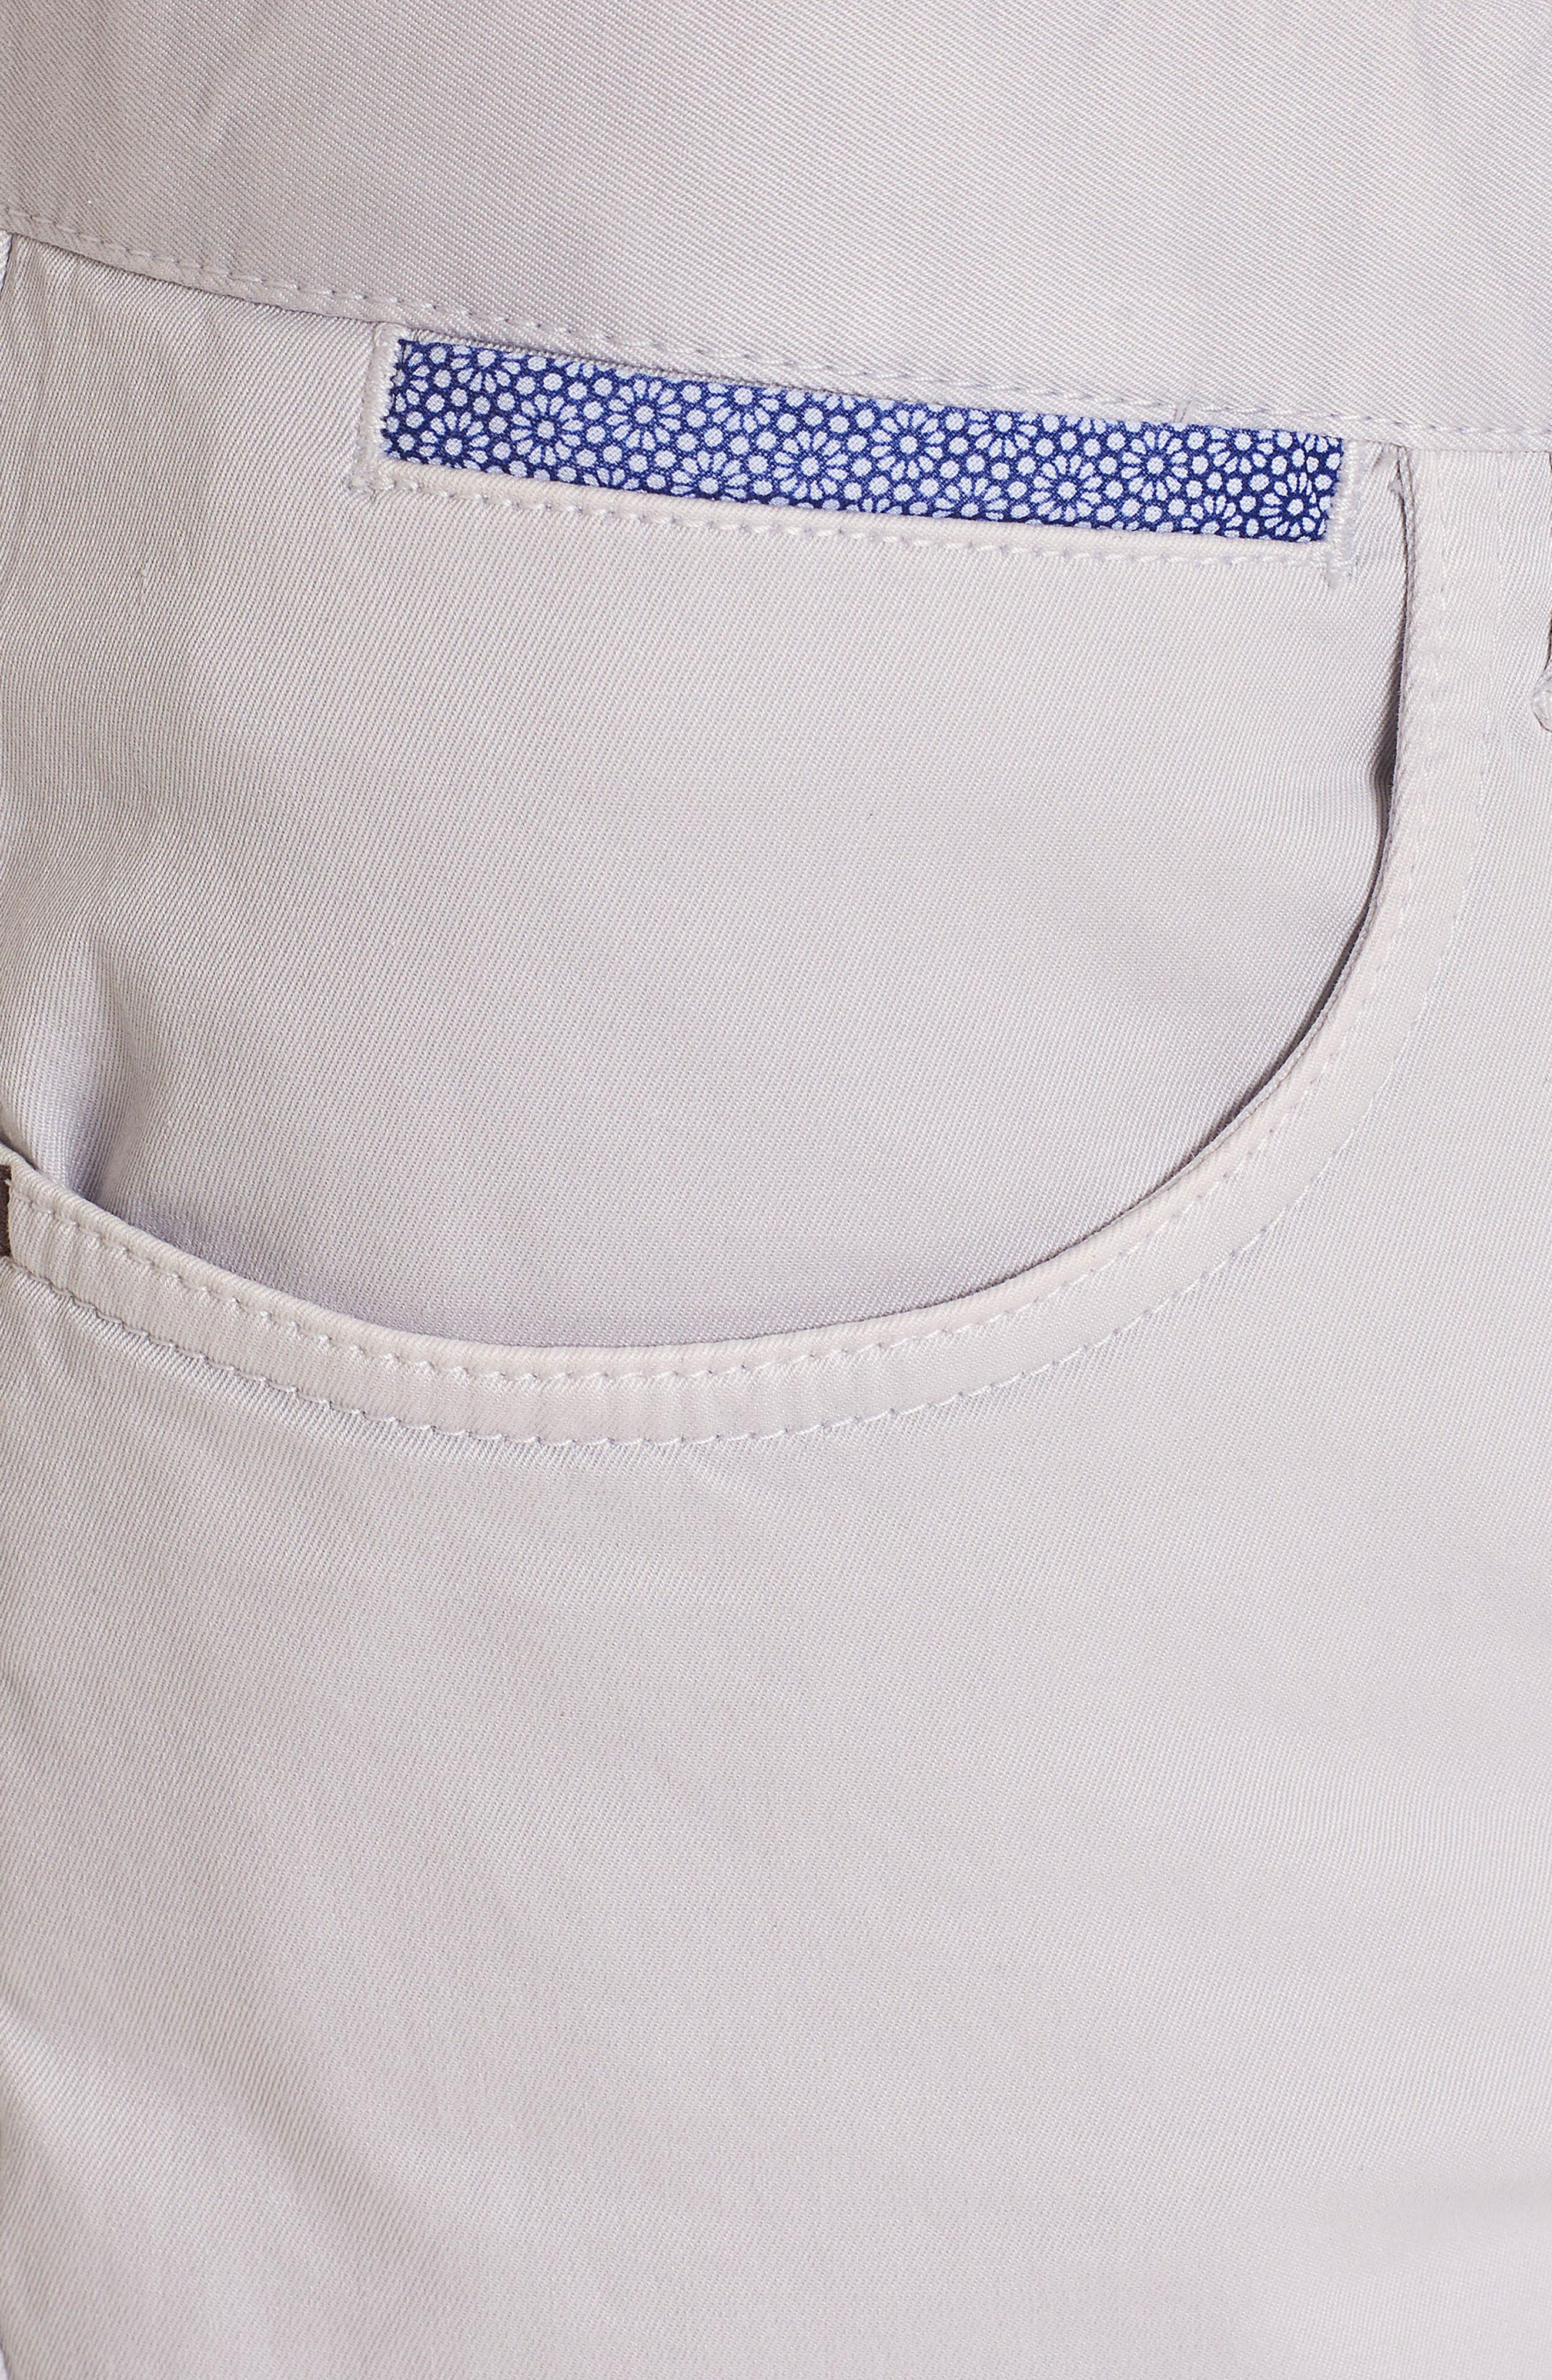 Marti Tailored Fit Pants,                             Alternate thumbnail 4, color,                             059